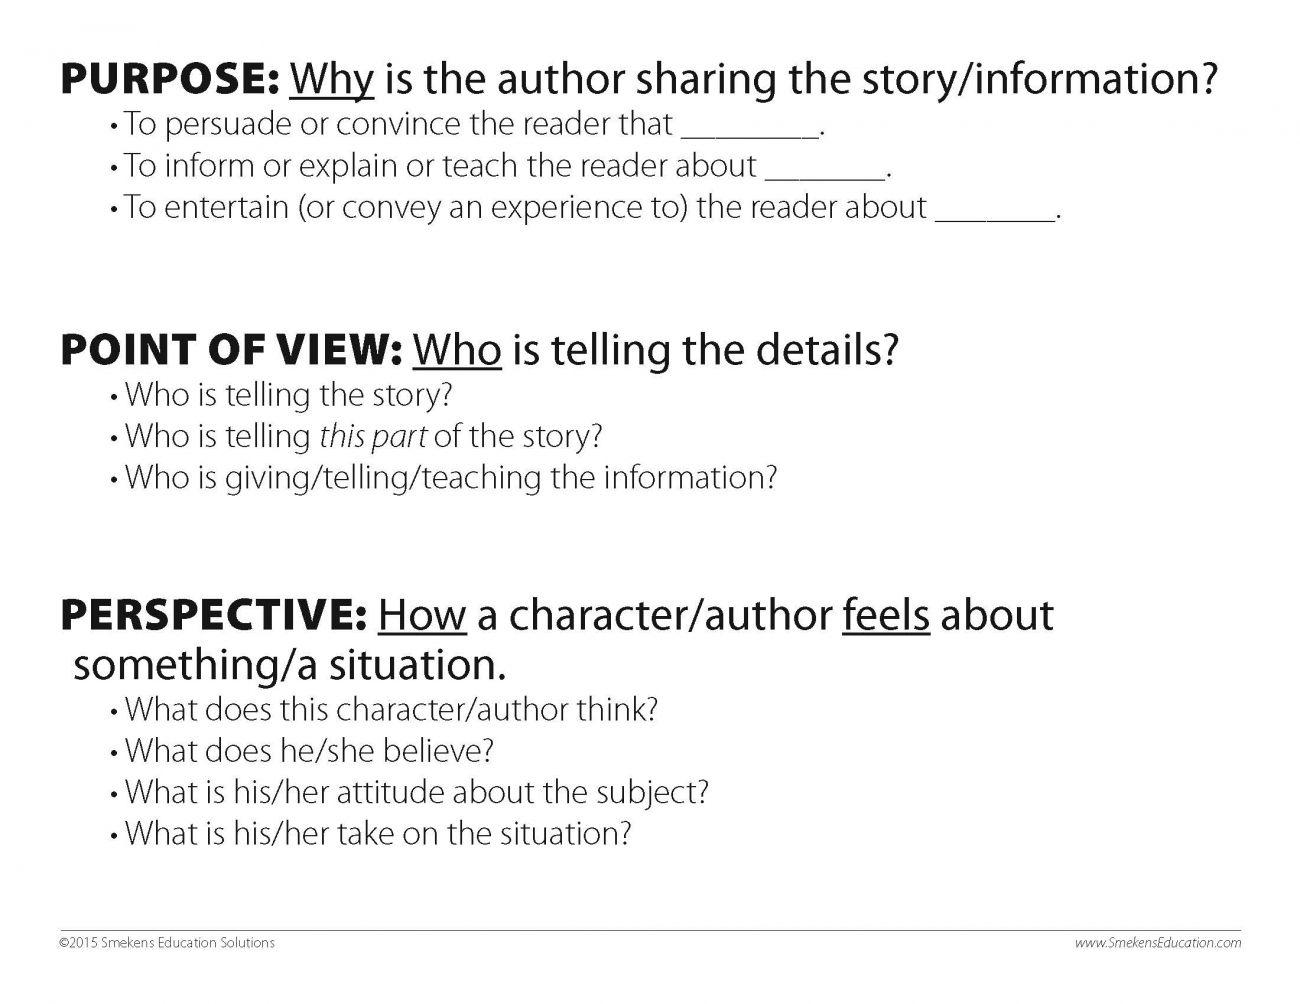 small resolution of 6 Traits of Writing – Professional Development - Clarify \u003cI\u003ePurpose\u003c/I\u003e  versus \u003cI\u003ePoint of View\u003c…   Authors perspective